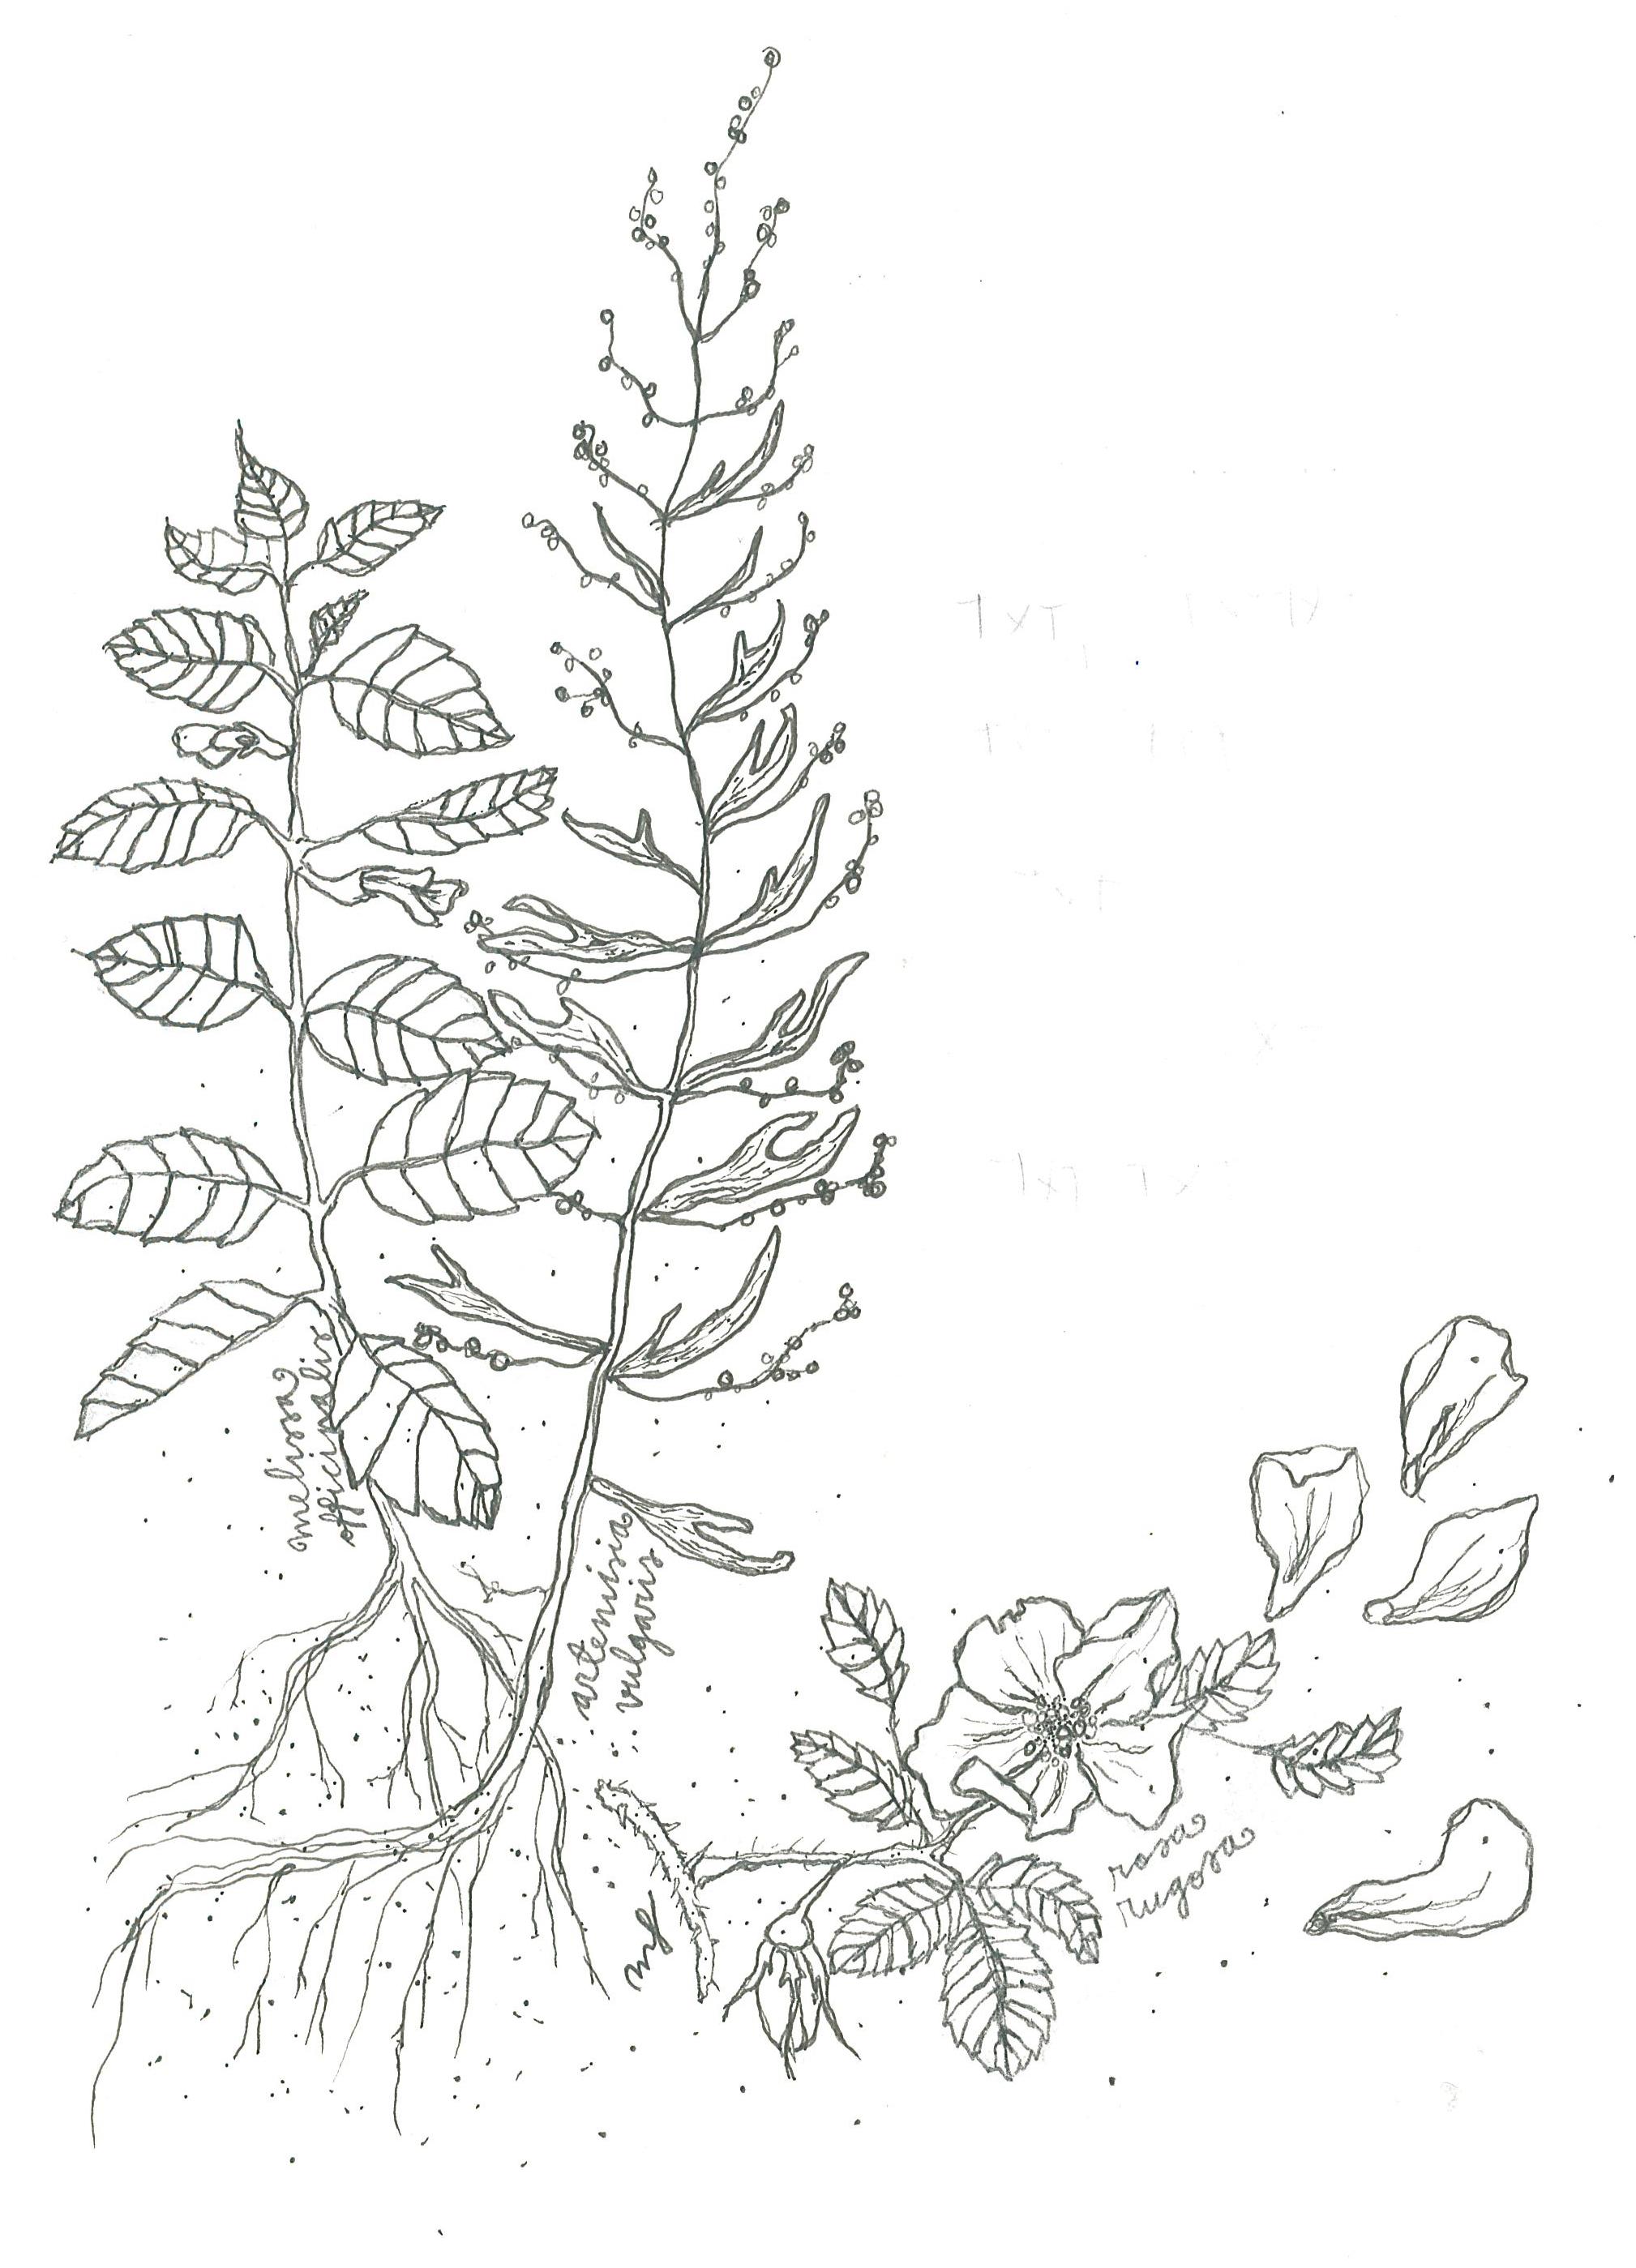 kasvit.jpg